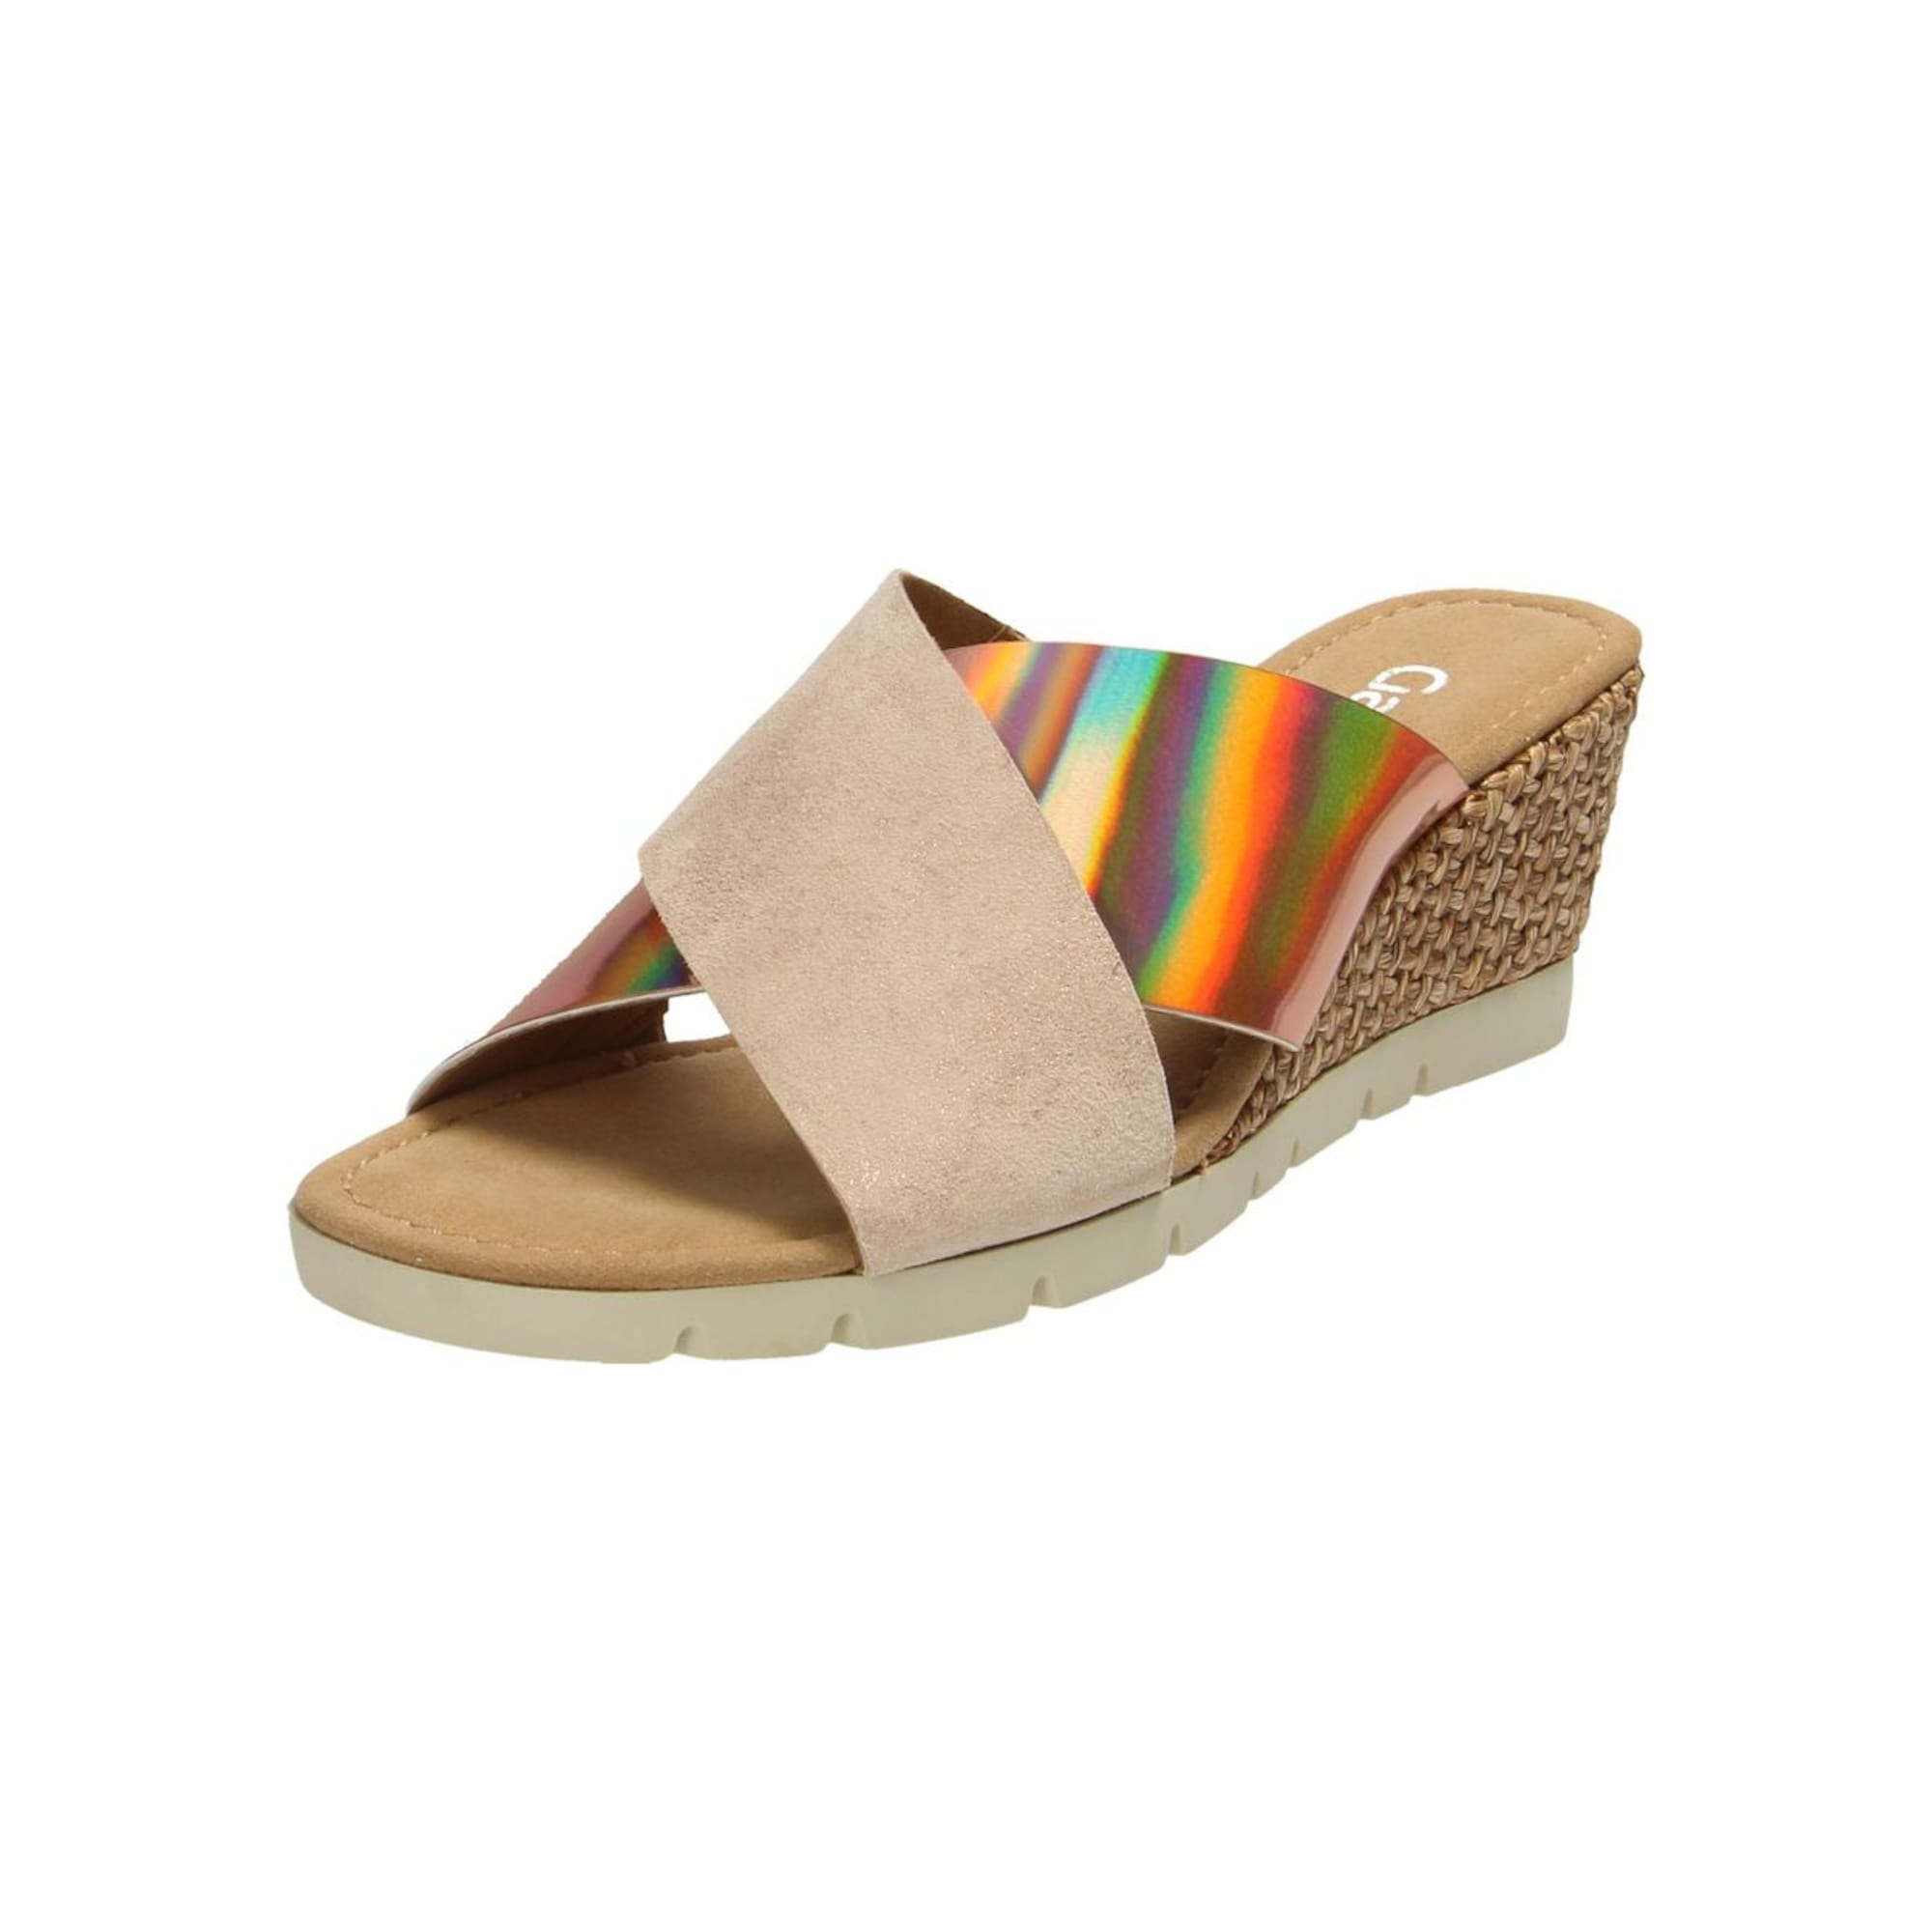 Pantoletten | Schuhe > Clogs & Pantoletten | Hellbeige | Gabor